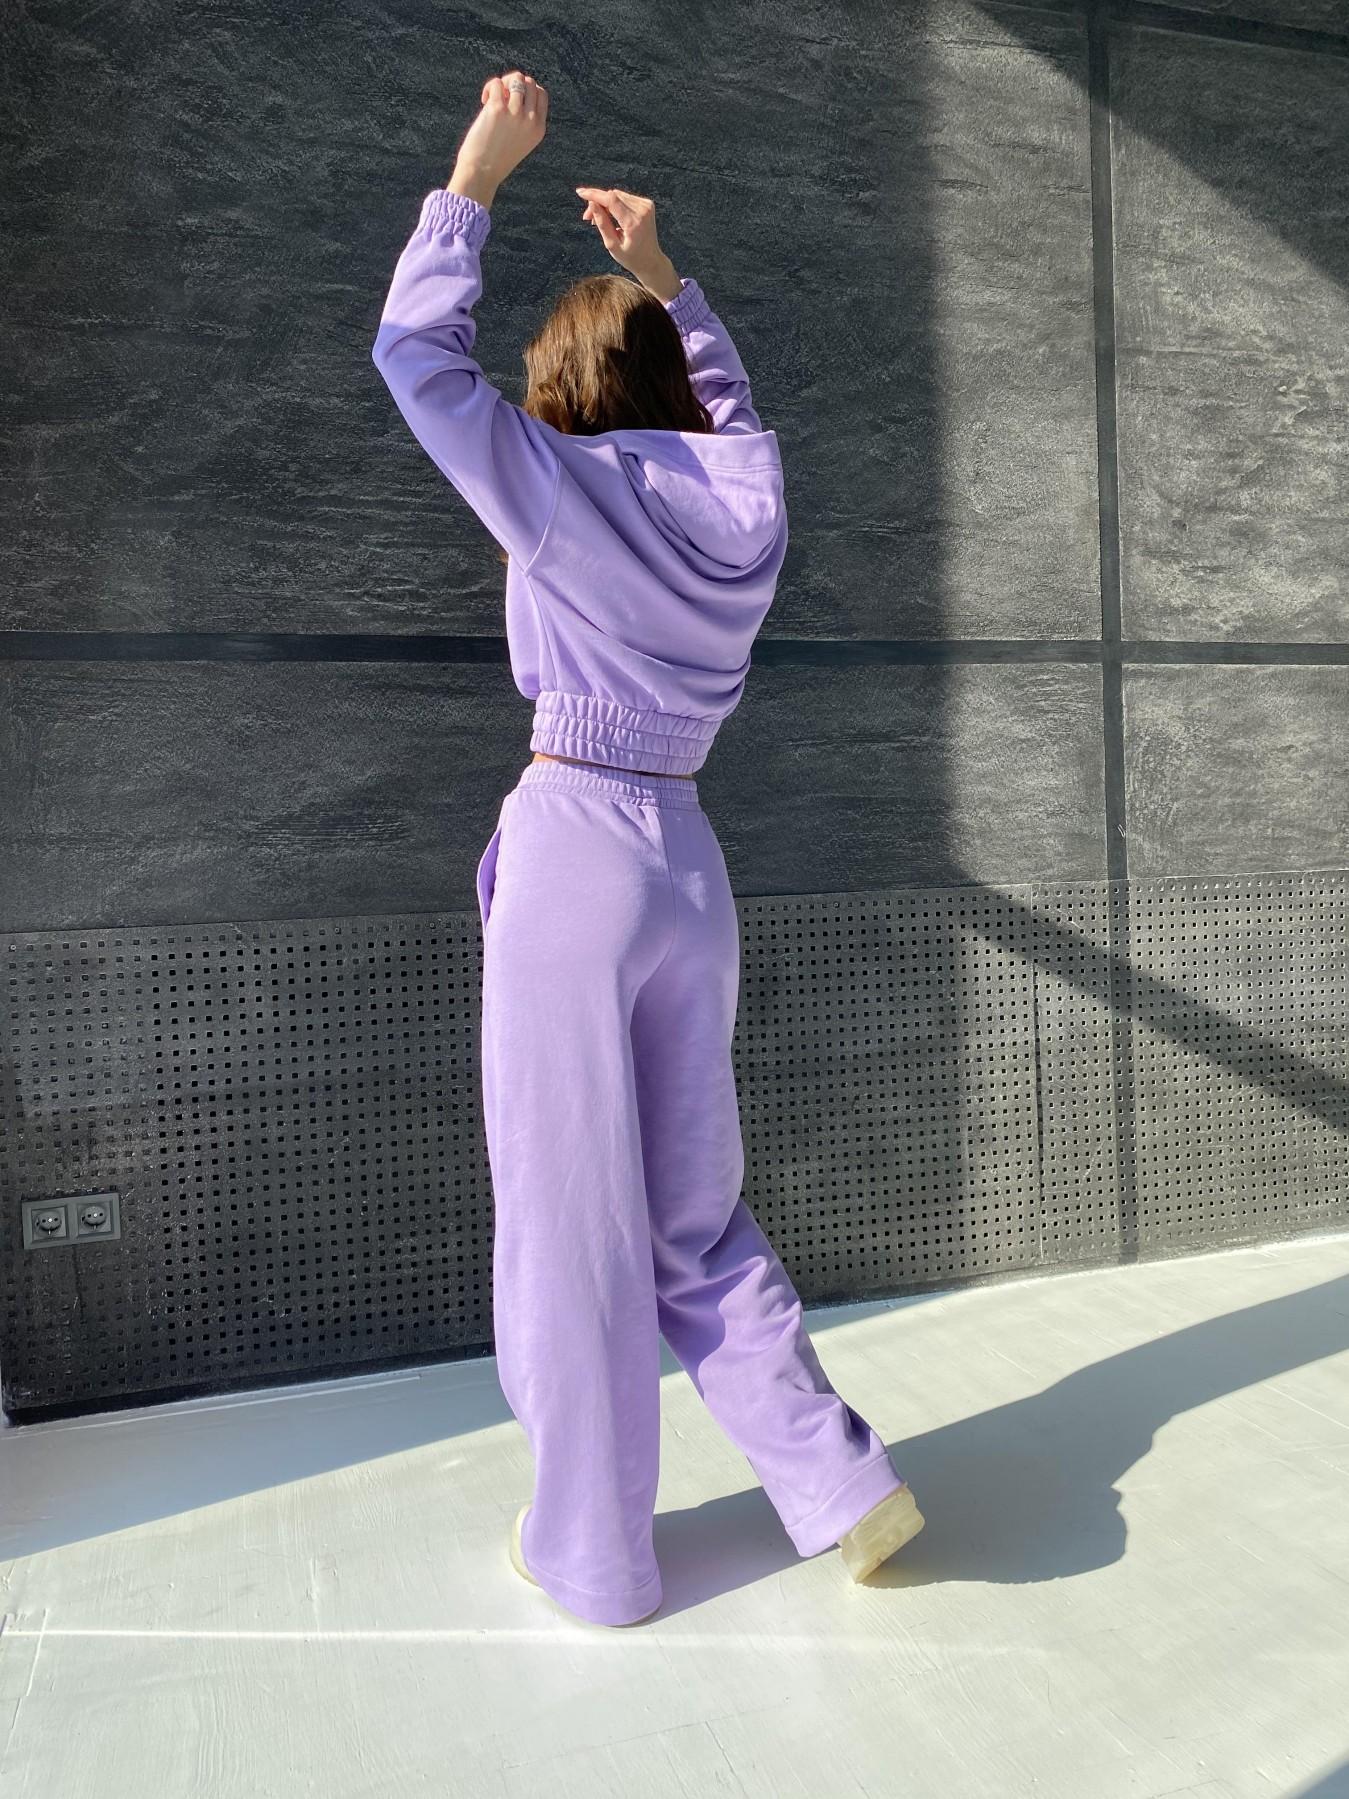 Бейби  прогулочный костюм из 3х нитки 10812 АРТ. 47283 Цвет: Лаванда - фото 4, интернет магазин tm-modus.ru